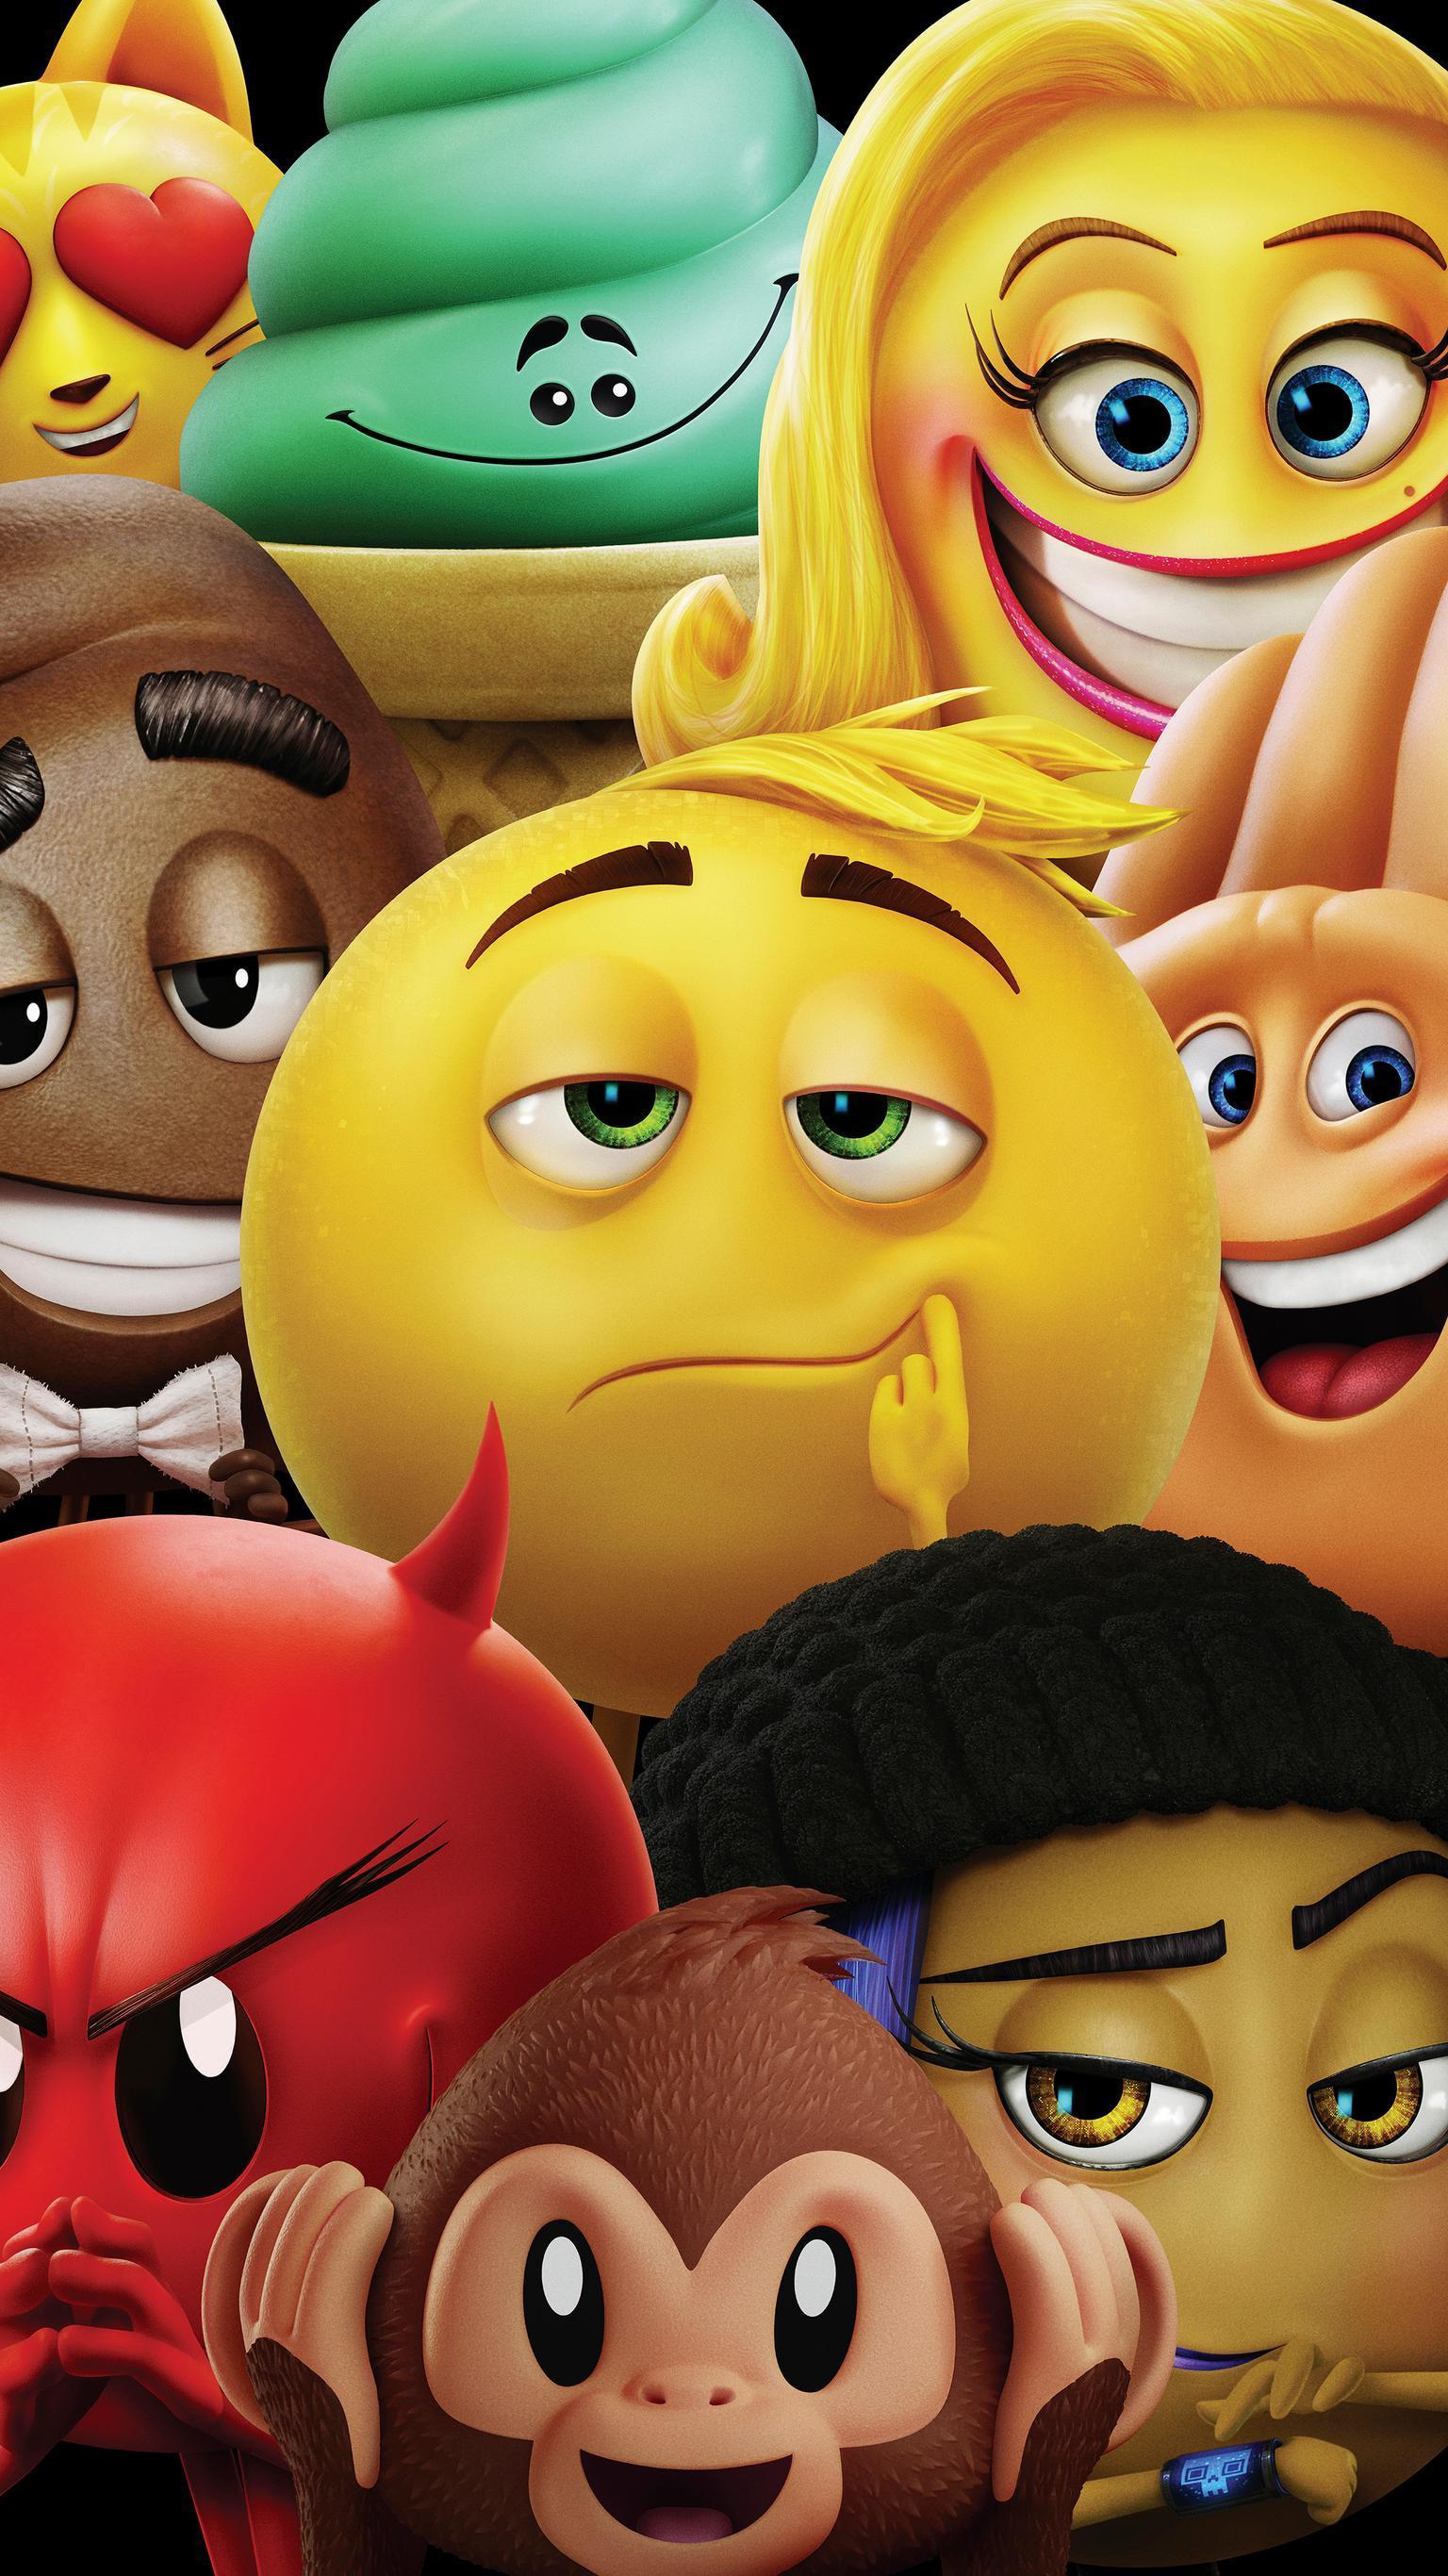 Emoji Phone Wallpapers Top Free Emoji Phone Backgrounds